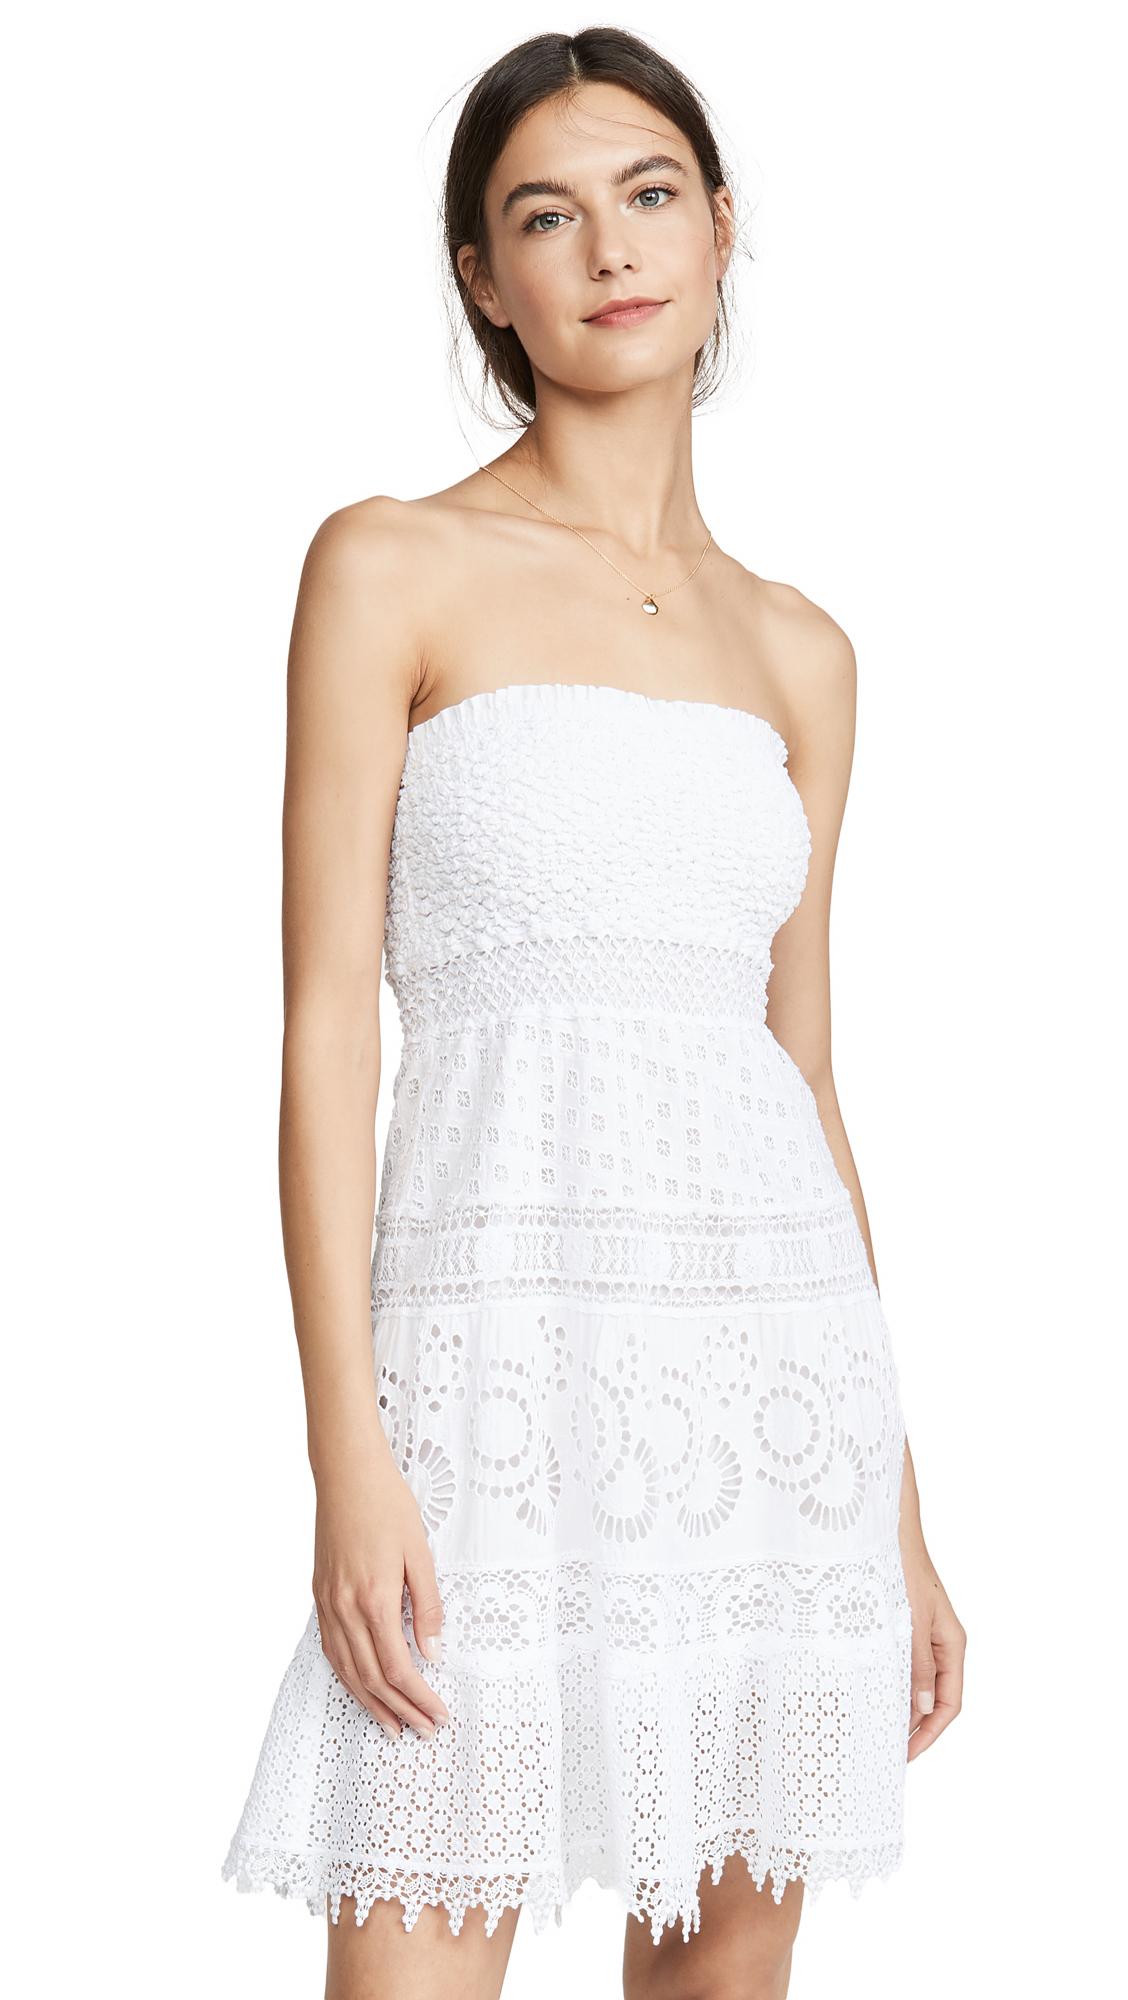 Temptation Positano Ostia Mini Dress – 40% Off Sale